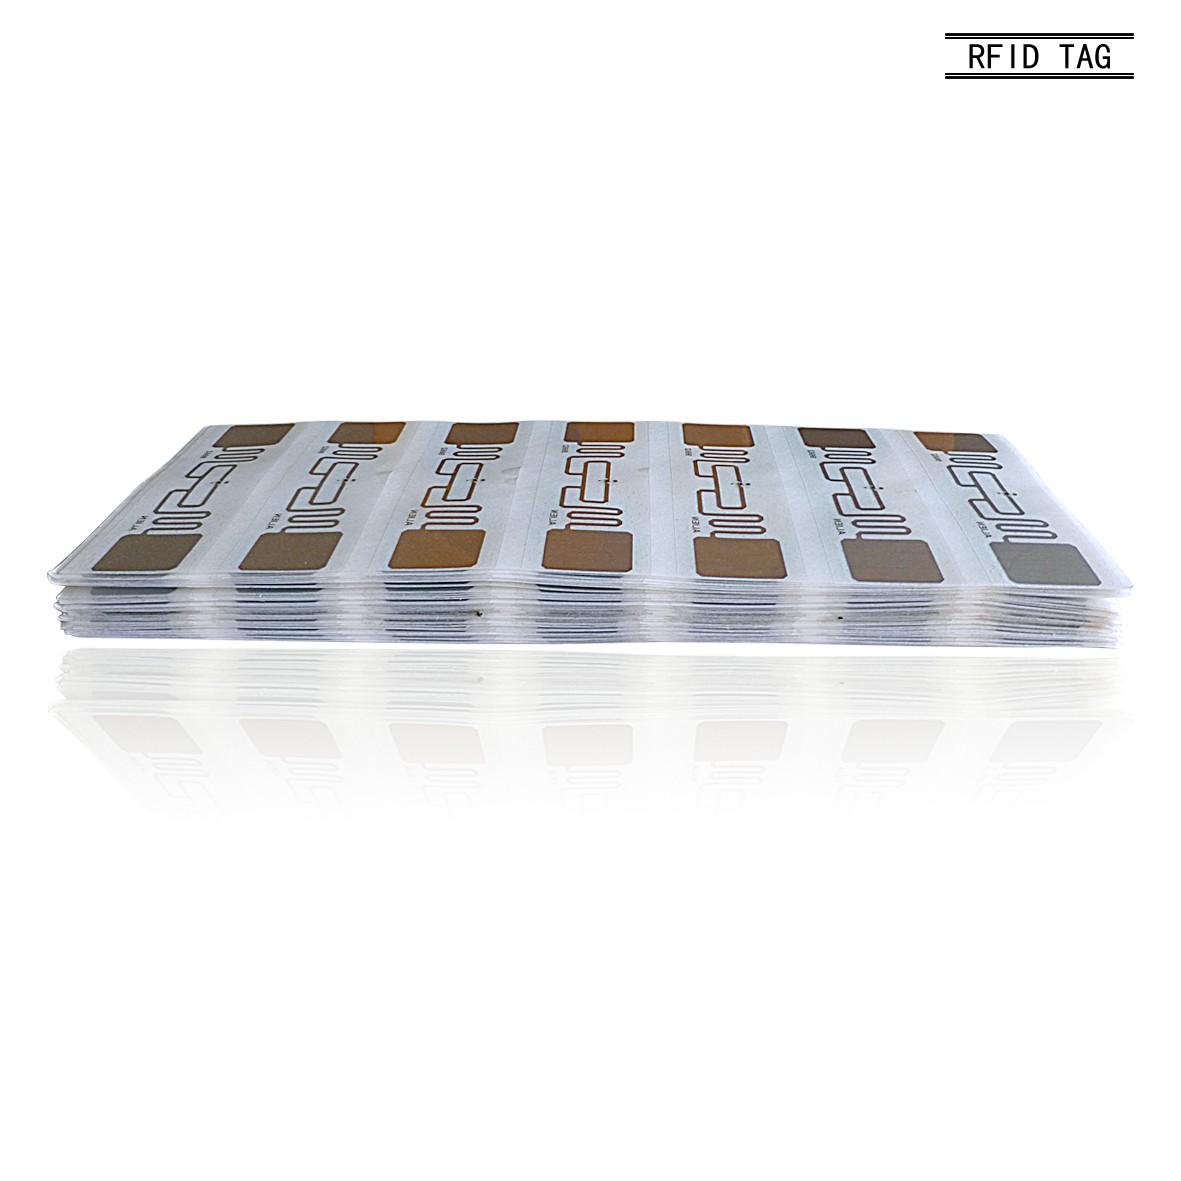 AZ9662 Alien H3 dry inlay uhf tag rfid passive tag for ...1181 x 1181 jpeg 107 КБ